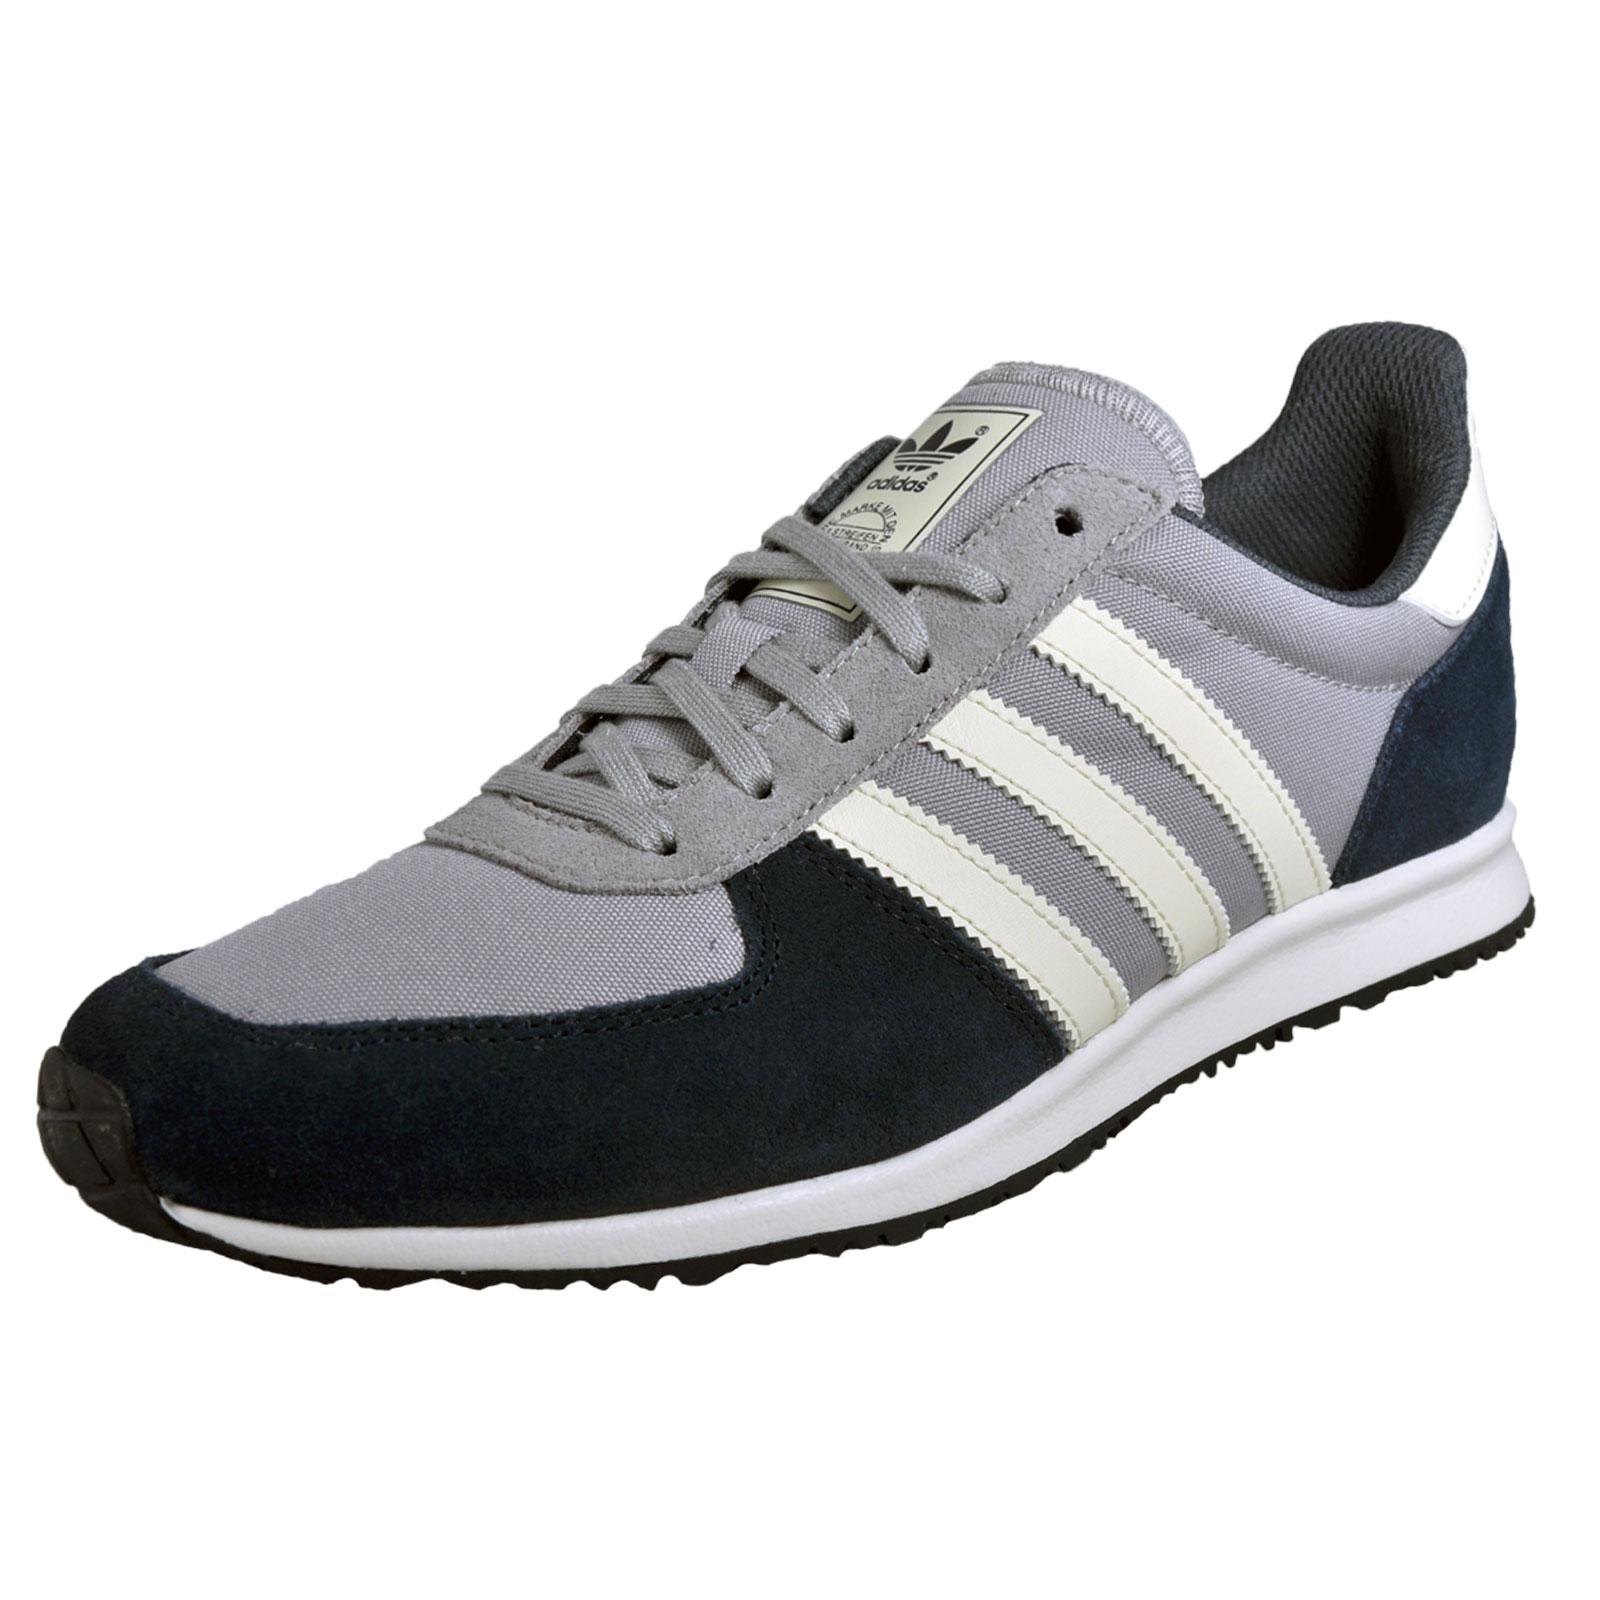 Adidas Adistar Racer Mens Casual Shoes